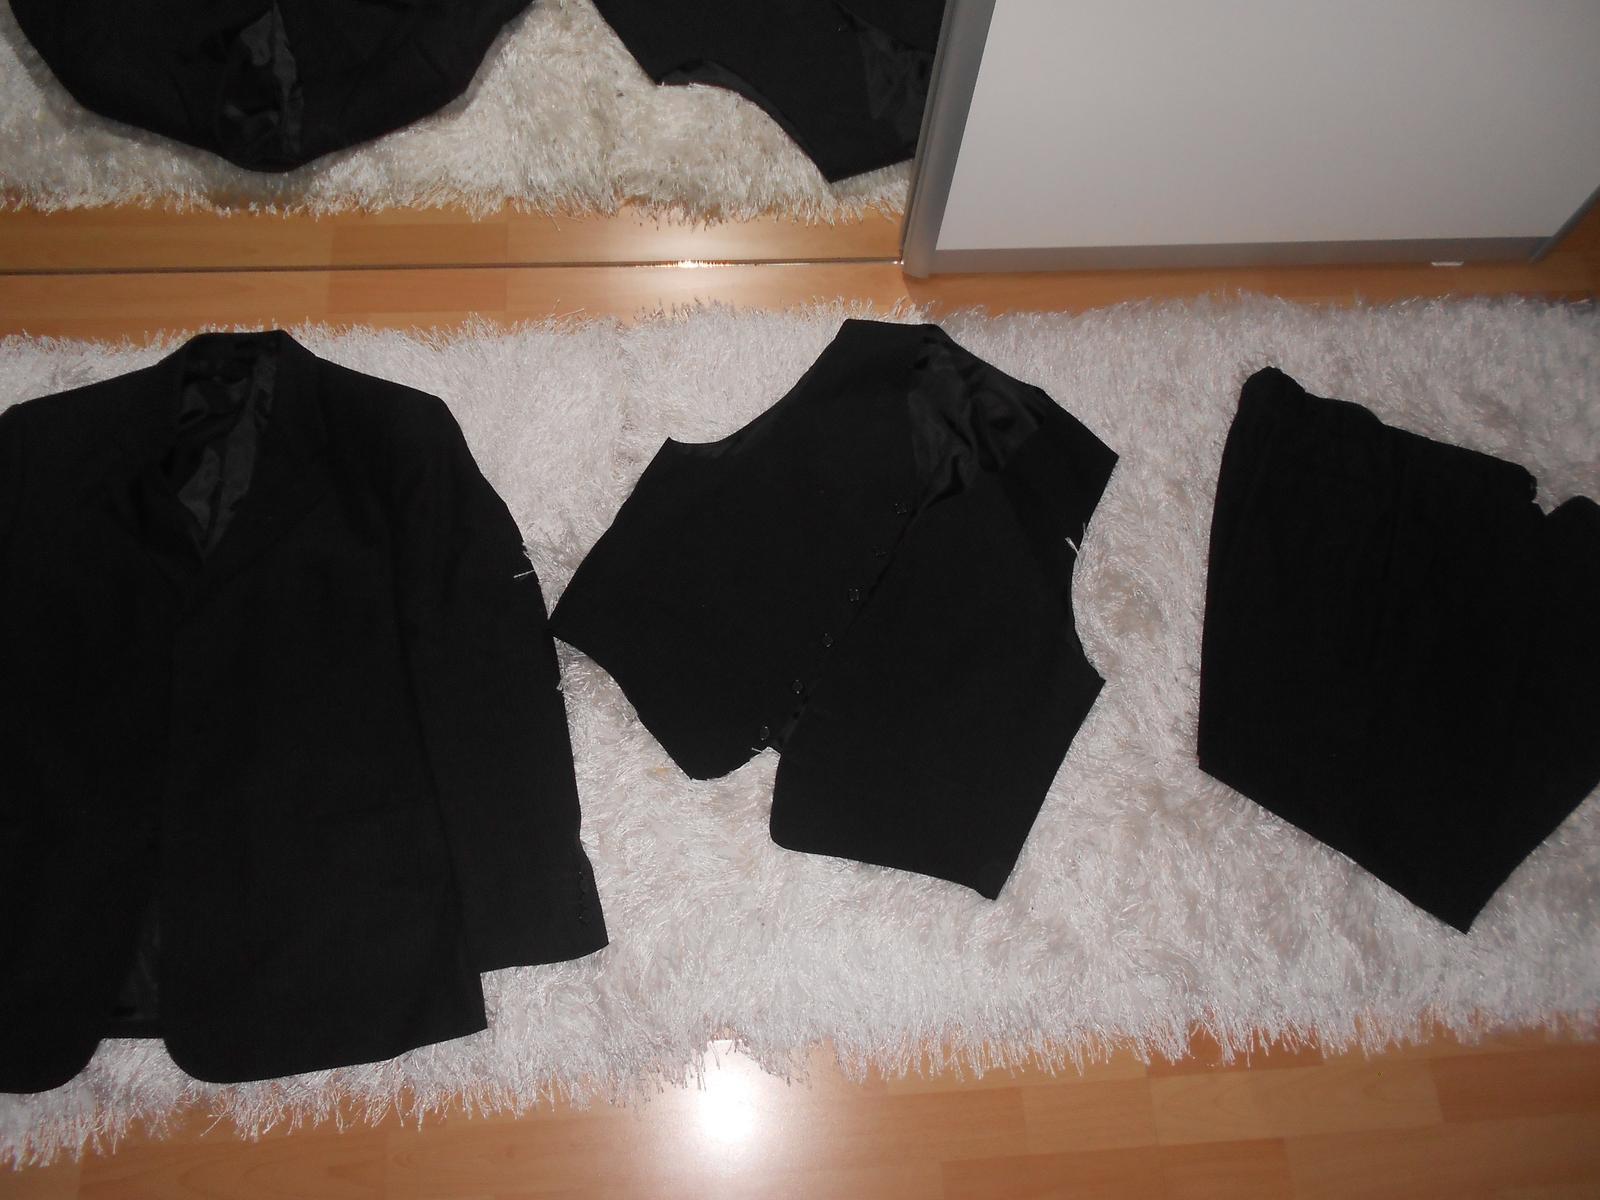 Oblek čierny + 2ks košele a kravaty gratis - Obrázok č. 1